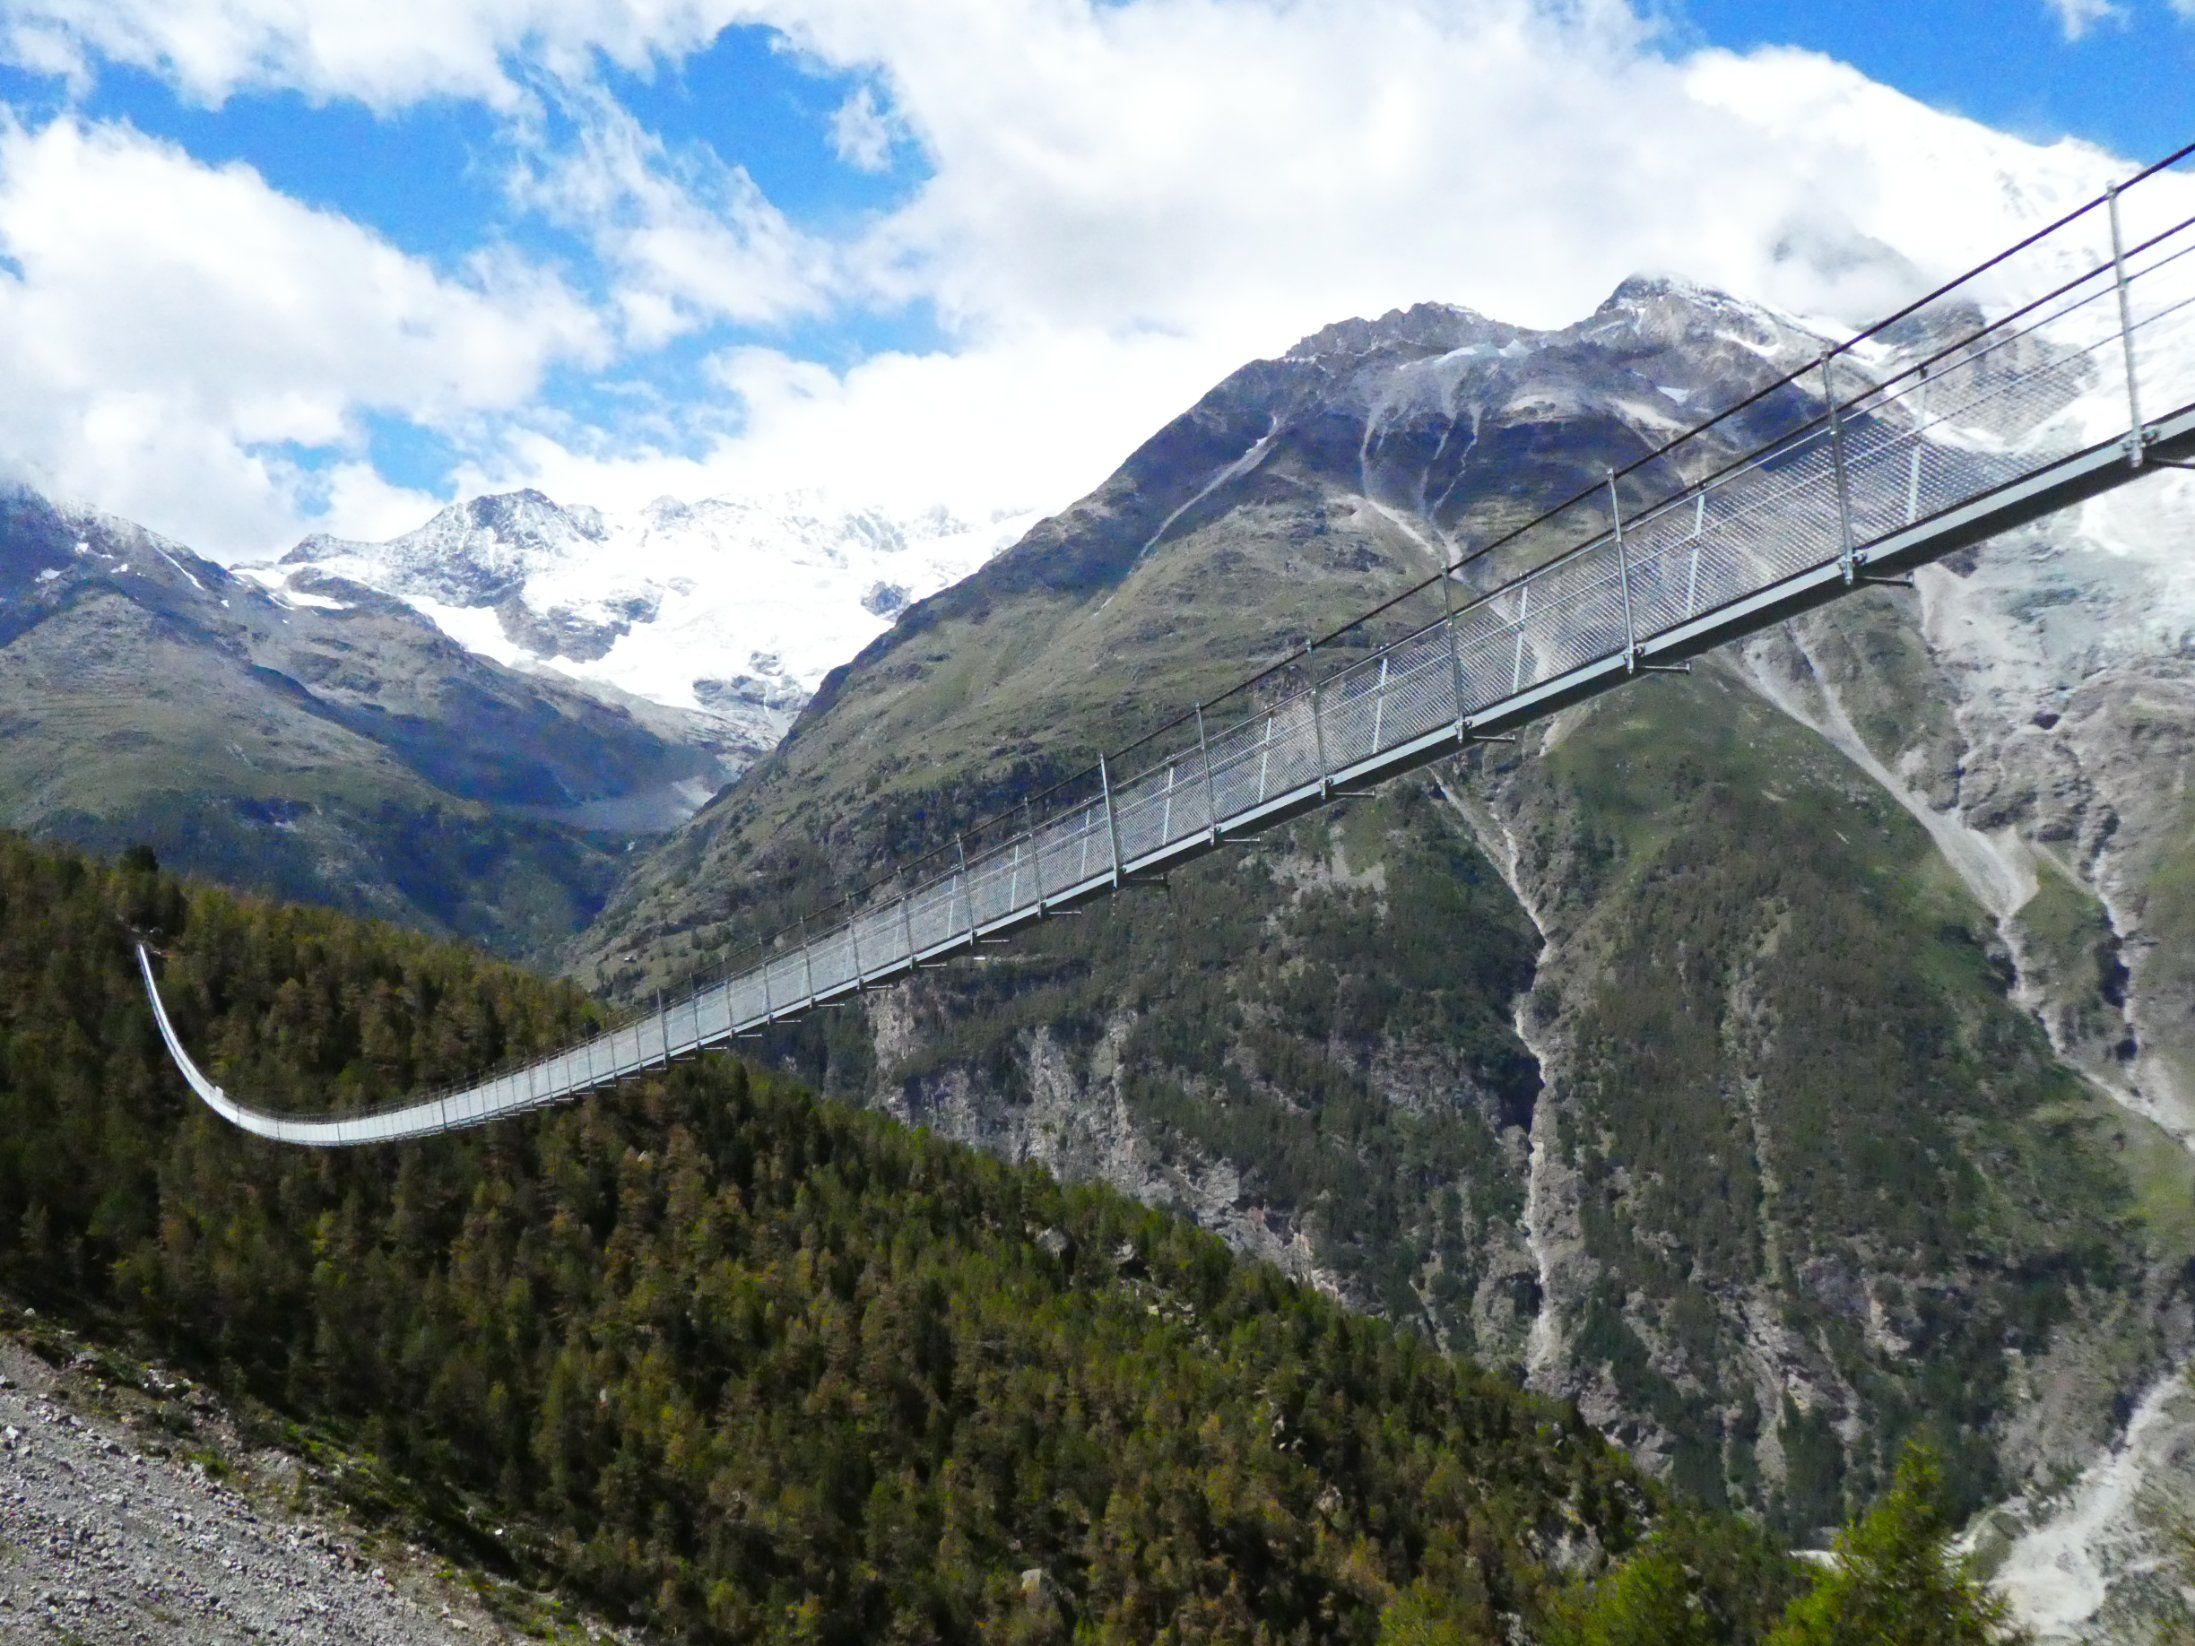 World's longest pedestrian suspension bridge opens - CNN Style